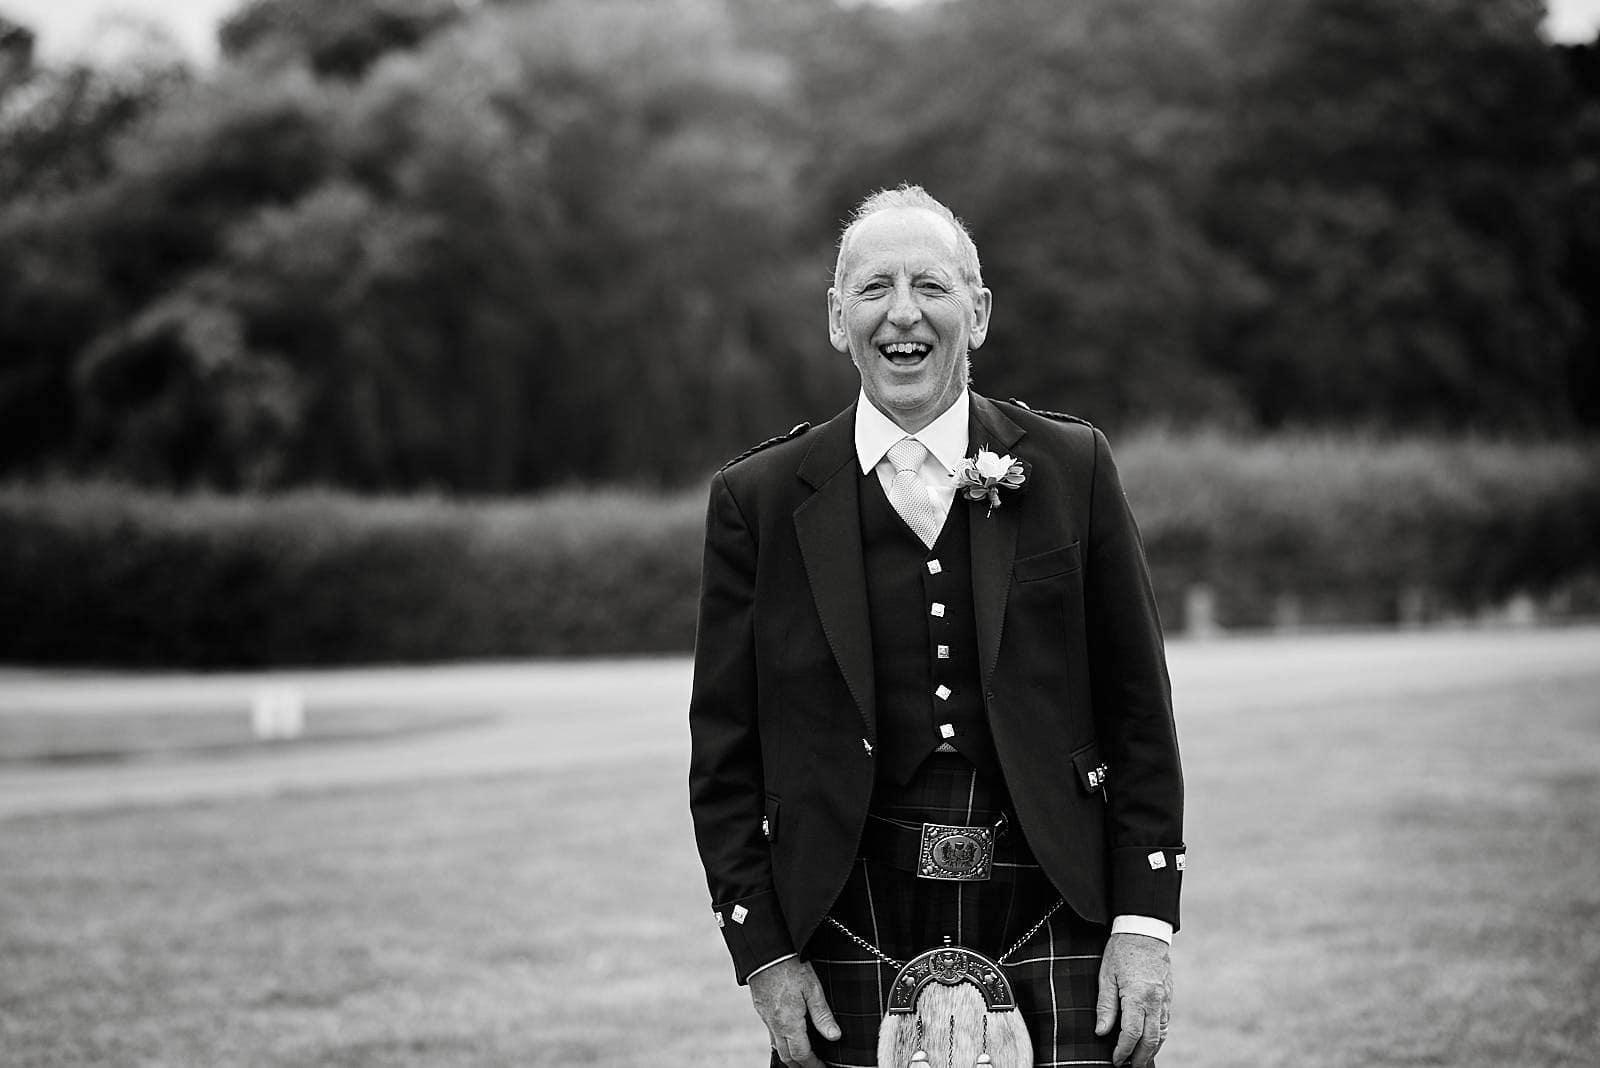 Smedmore House Wedding Photographer - Libra Photographic